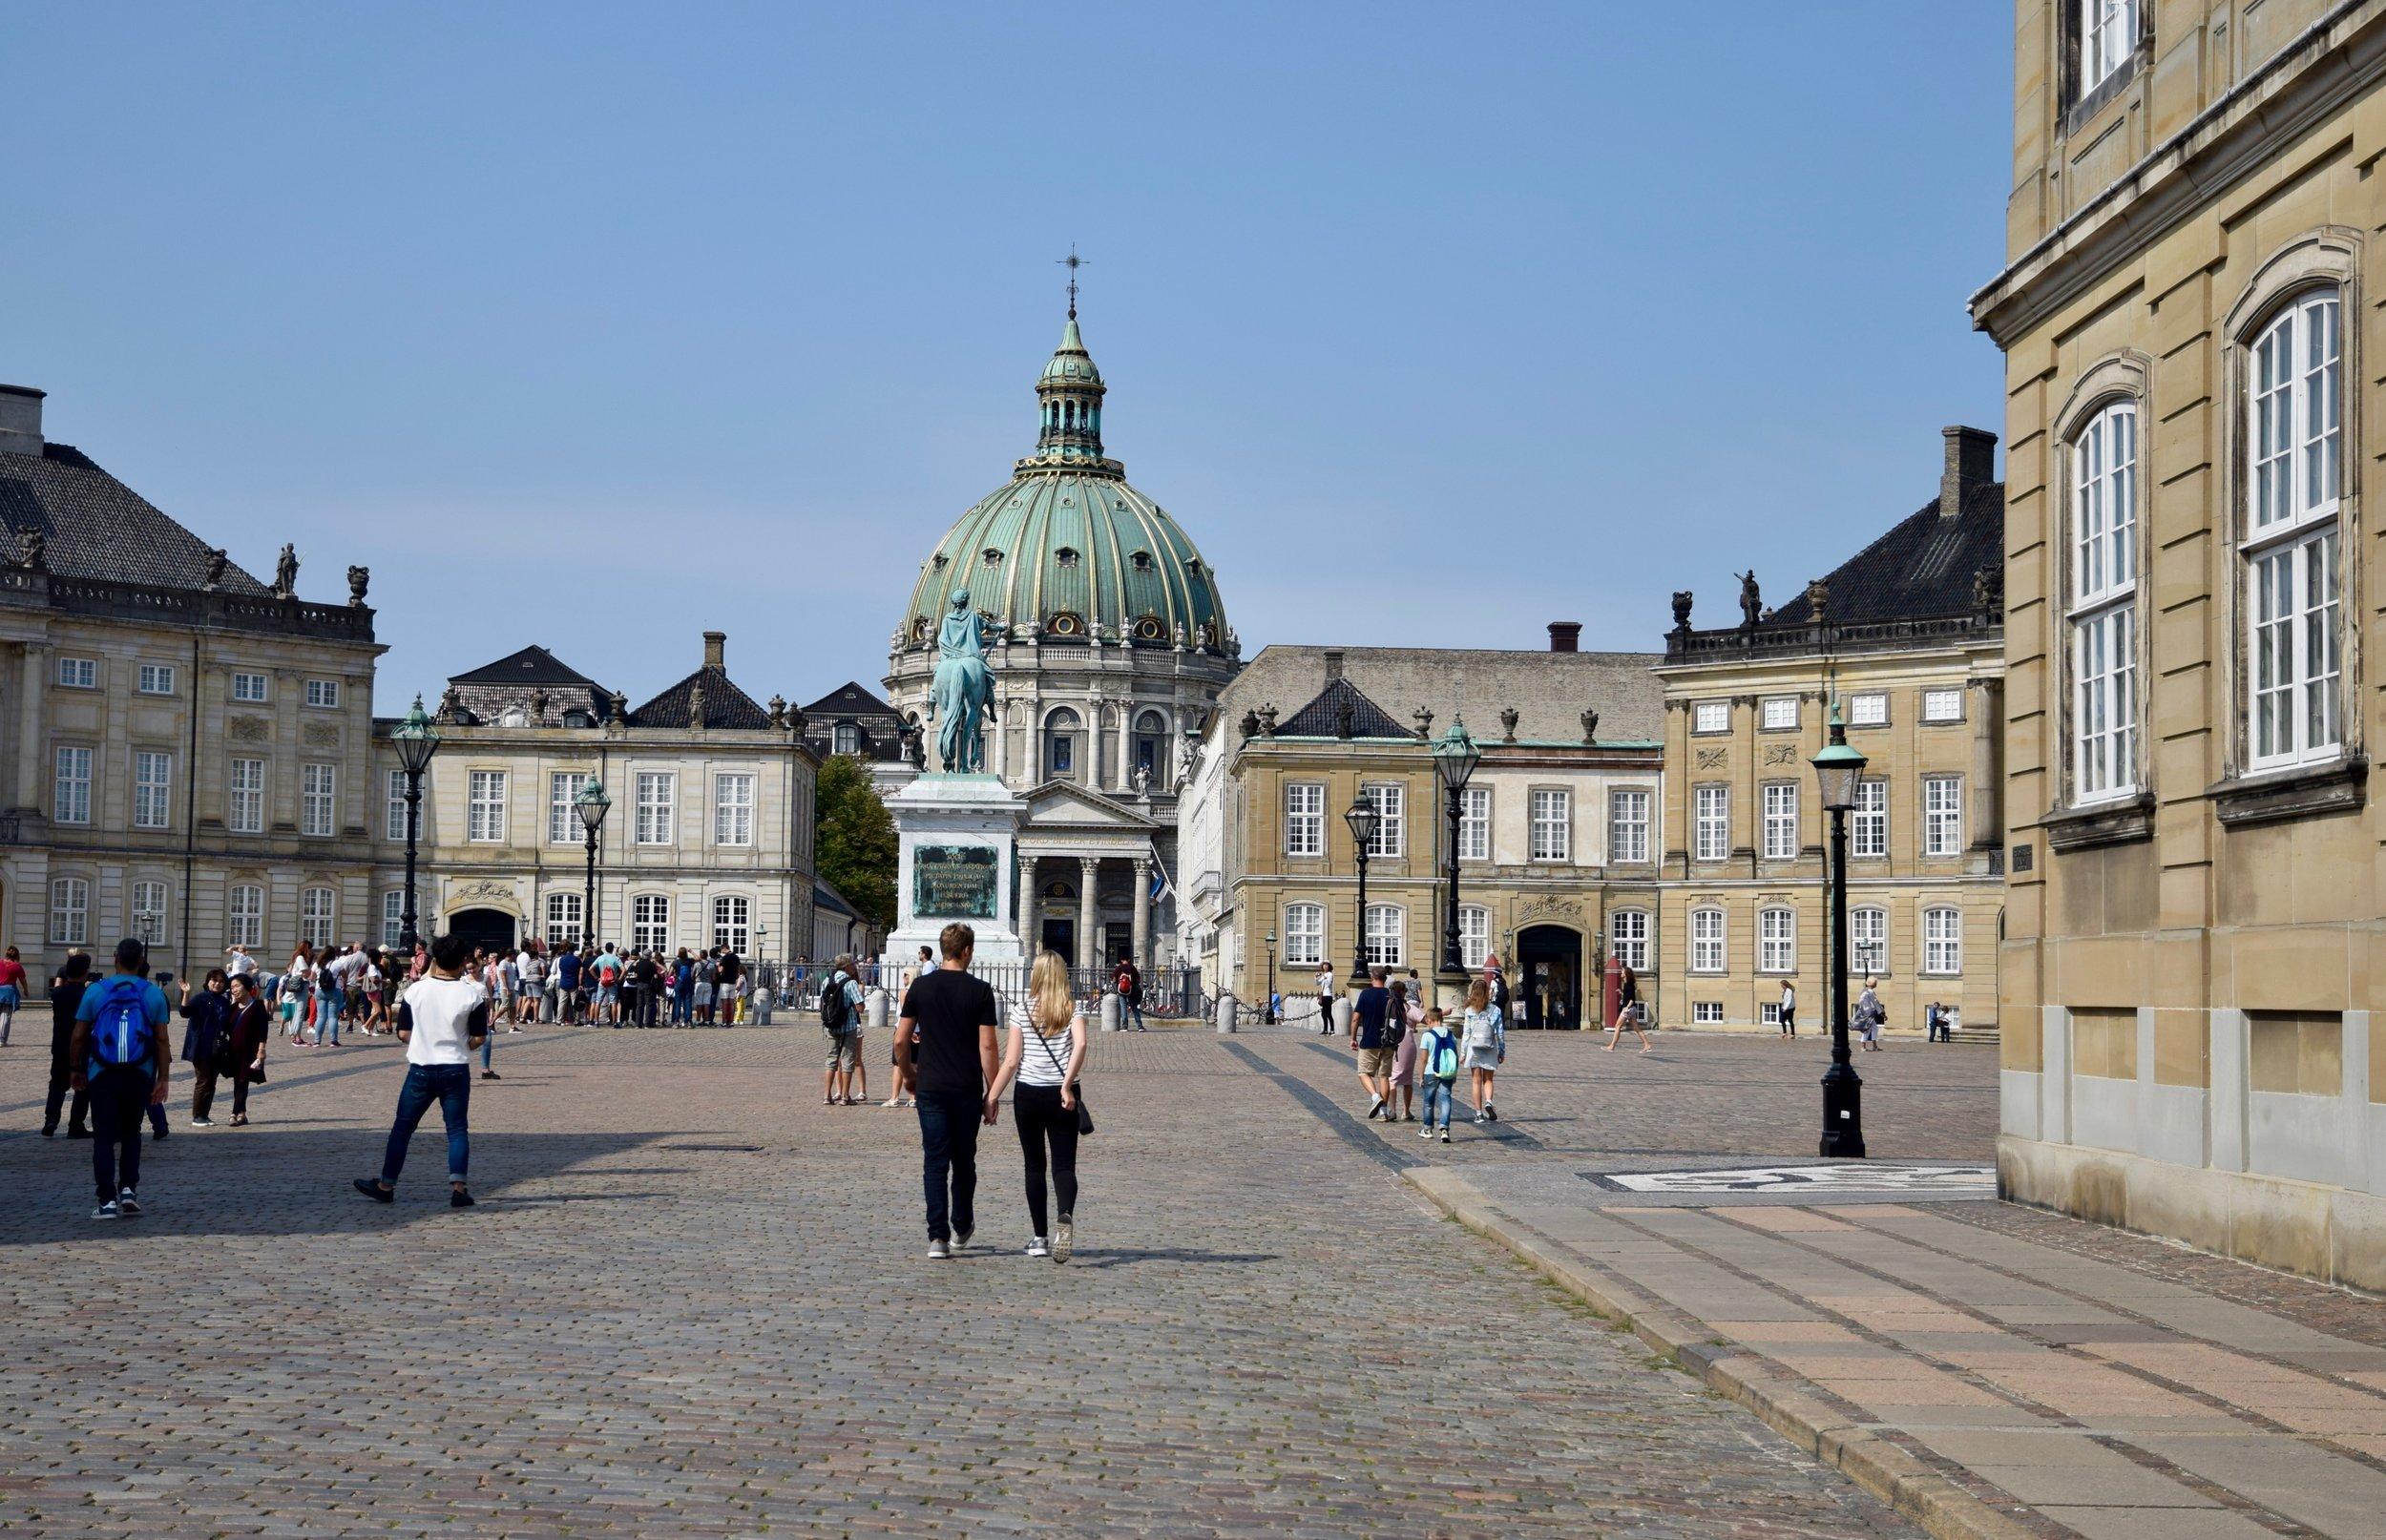 The Square at Amalienborg